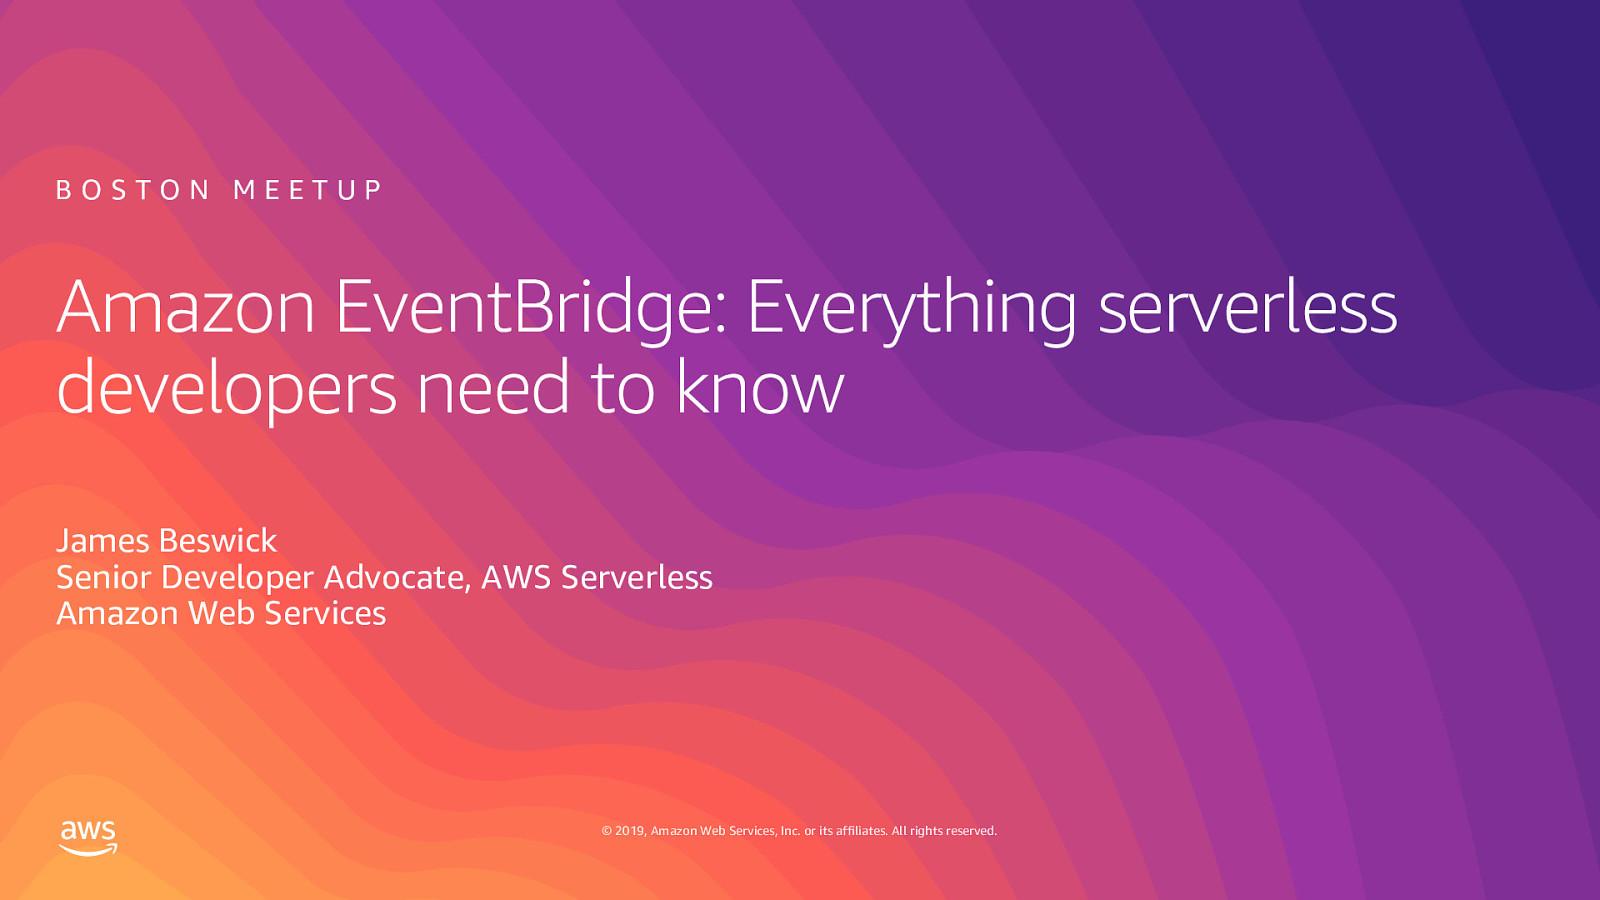 Amazon EventBridge: Everything serverless developers need to know